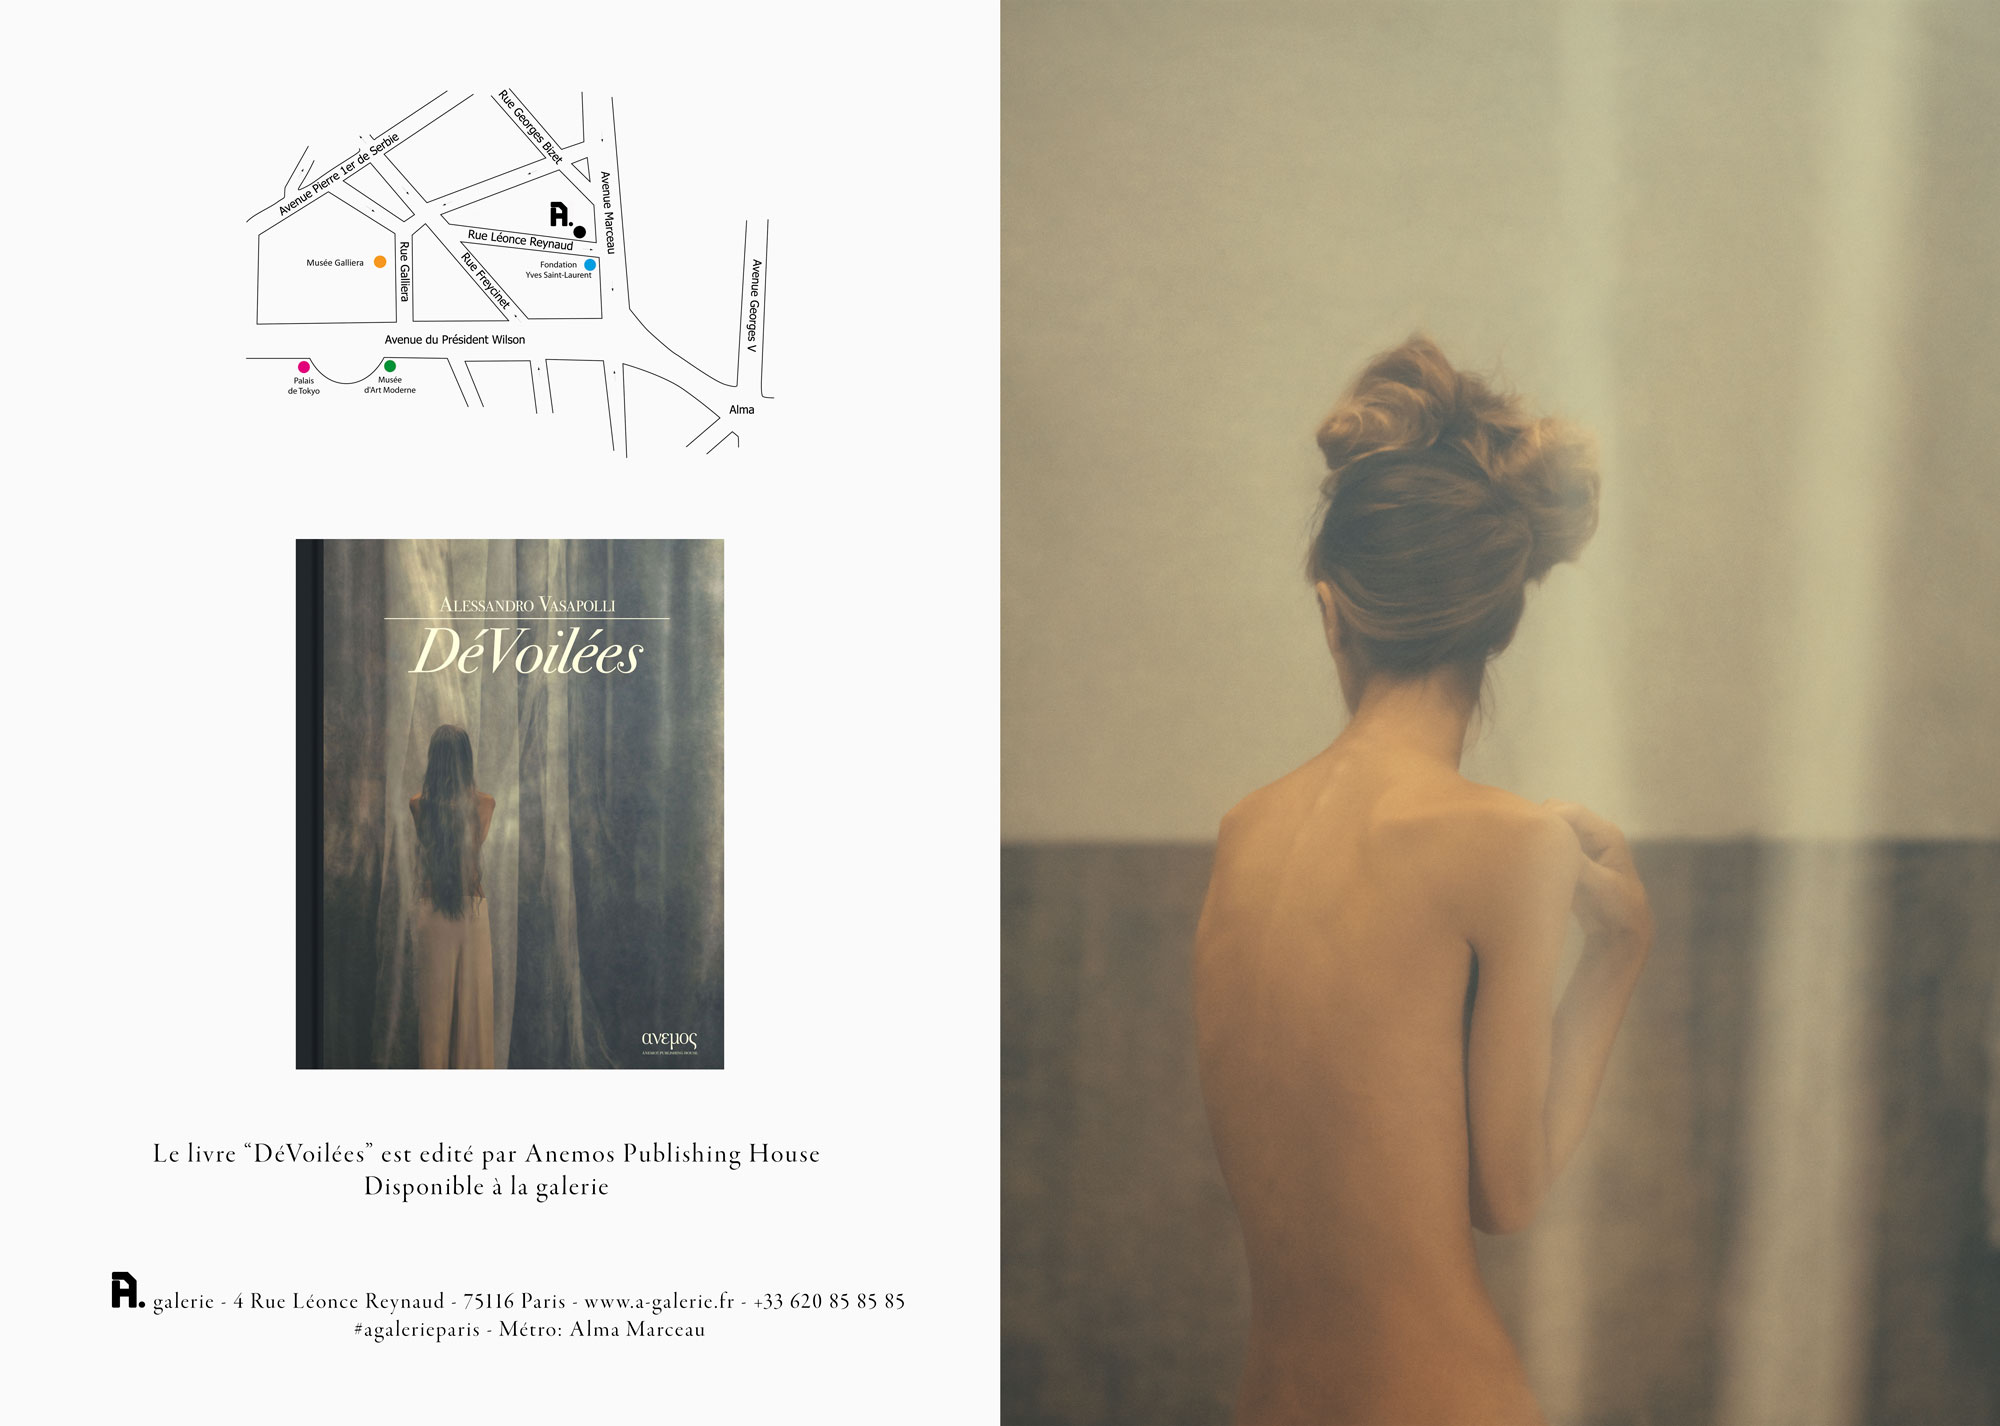 Invitation_A_Galerie_Alessandro_Vasapolli_DeVoilees_1